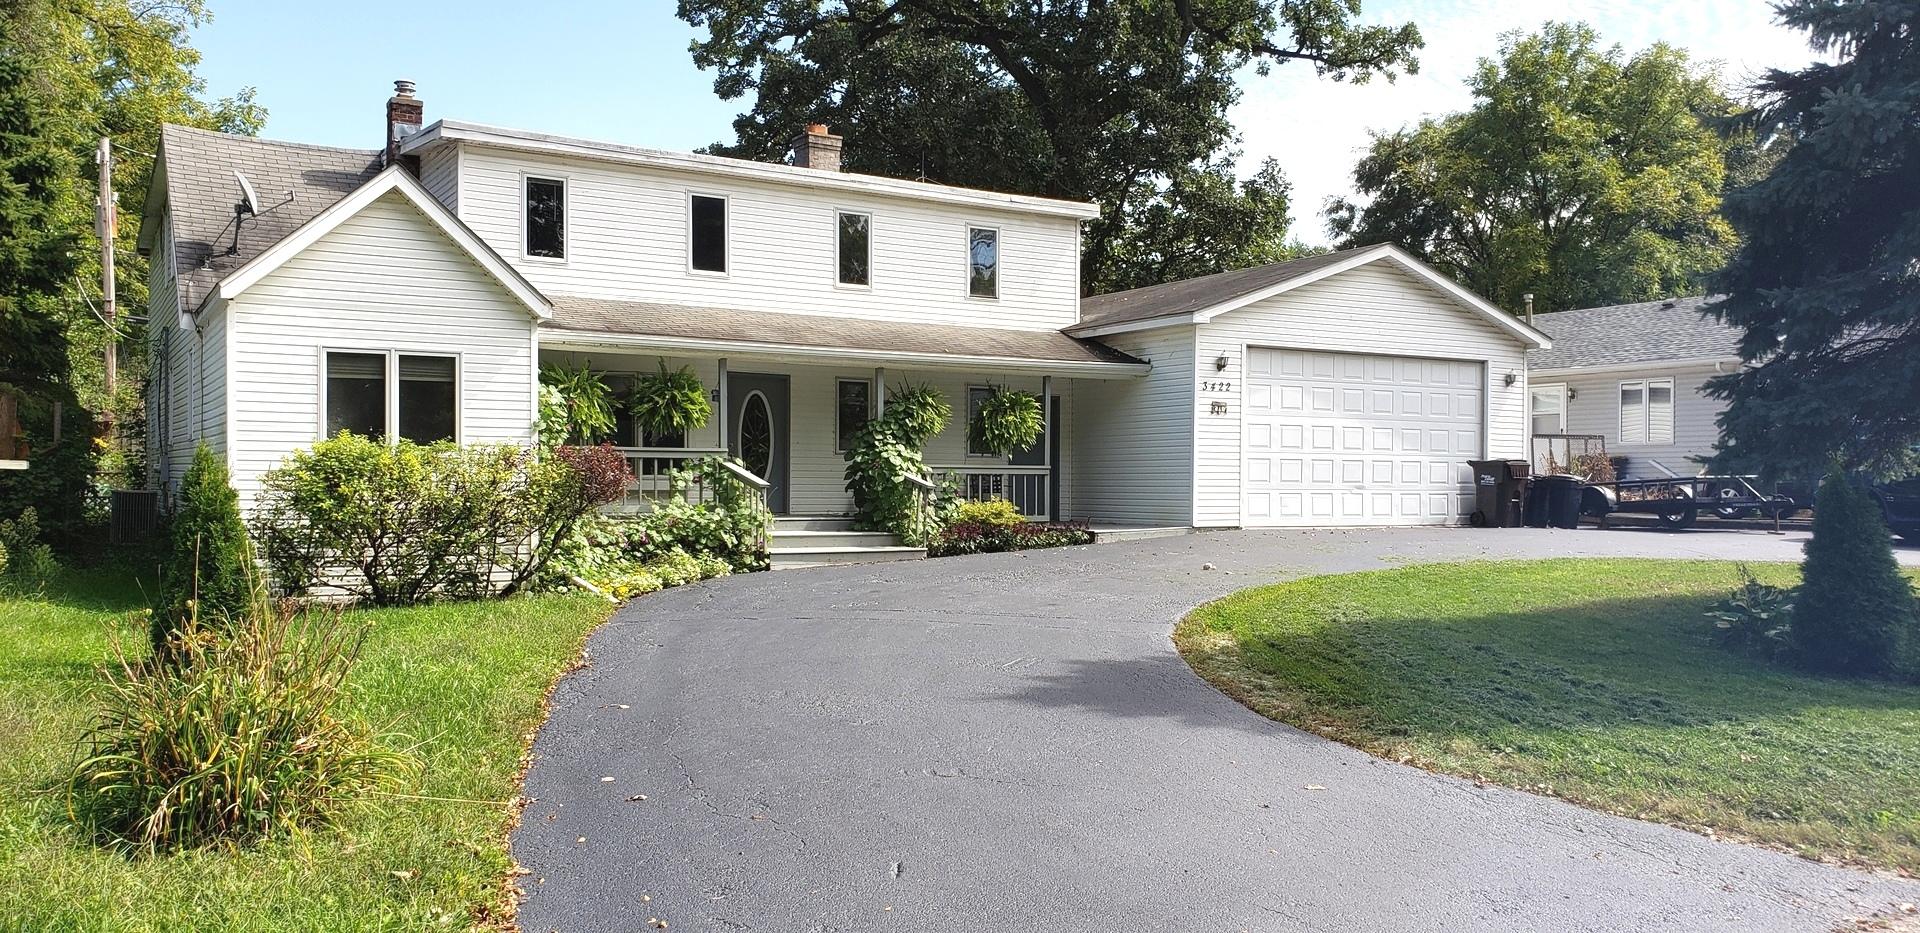 3422 Oakwood Drive, Island Lake, IL 60042